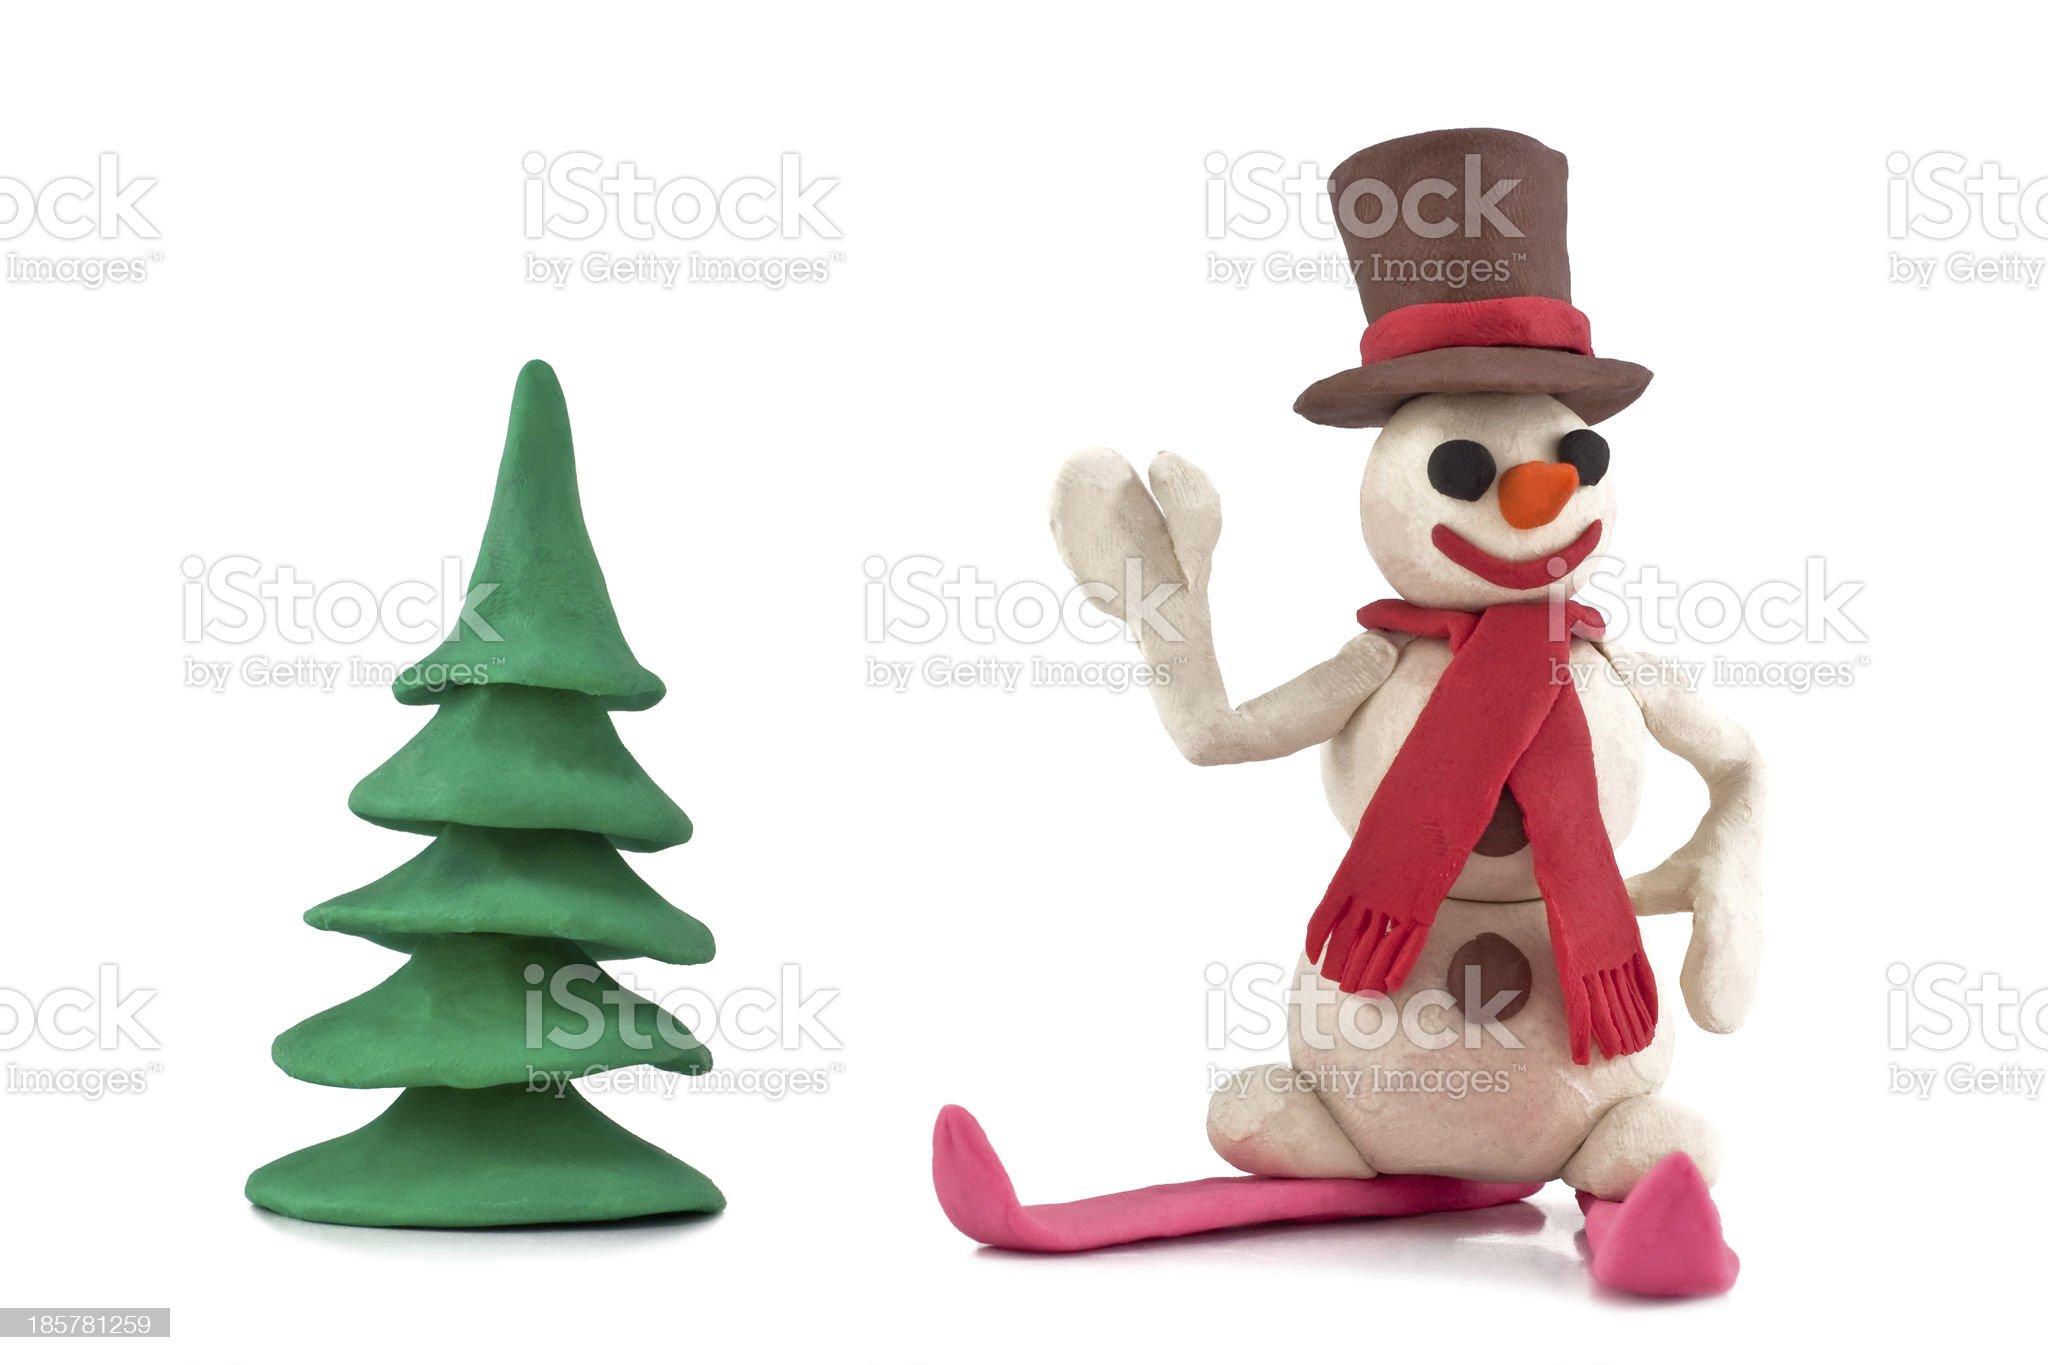 plasticine skiing snowman standing near the Christmas tree royalty-free stock photo